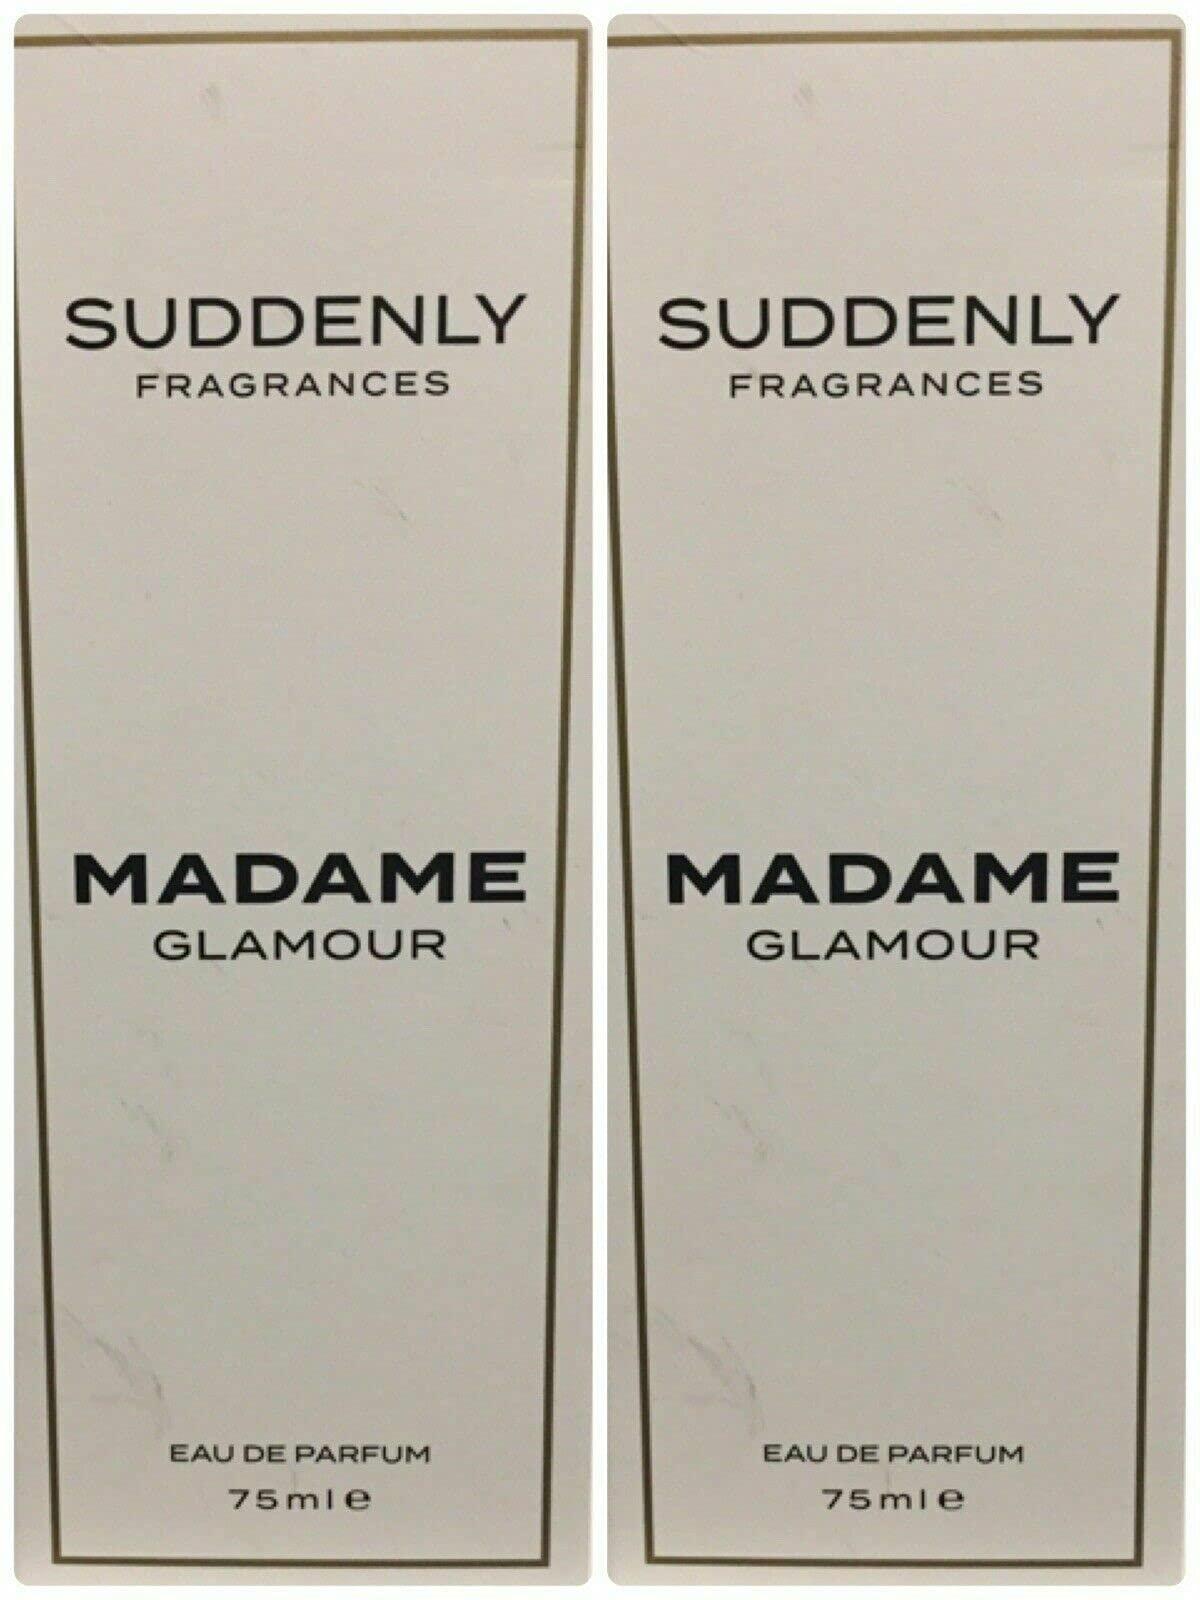 2x SUDDENLY MADAME GLAMOUR Eau de Parfume 50ml by Suddenly Madame Glamour